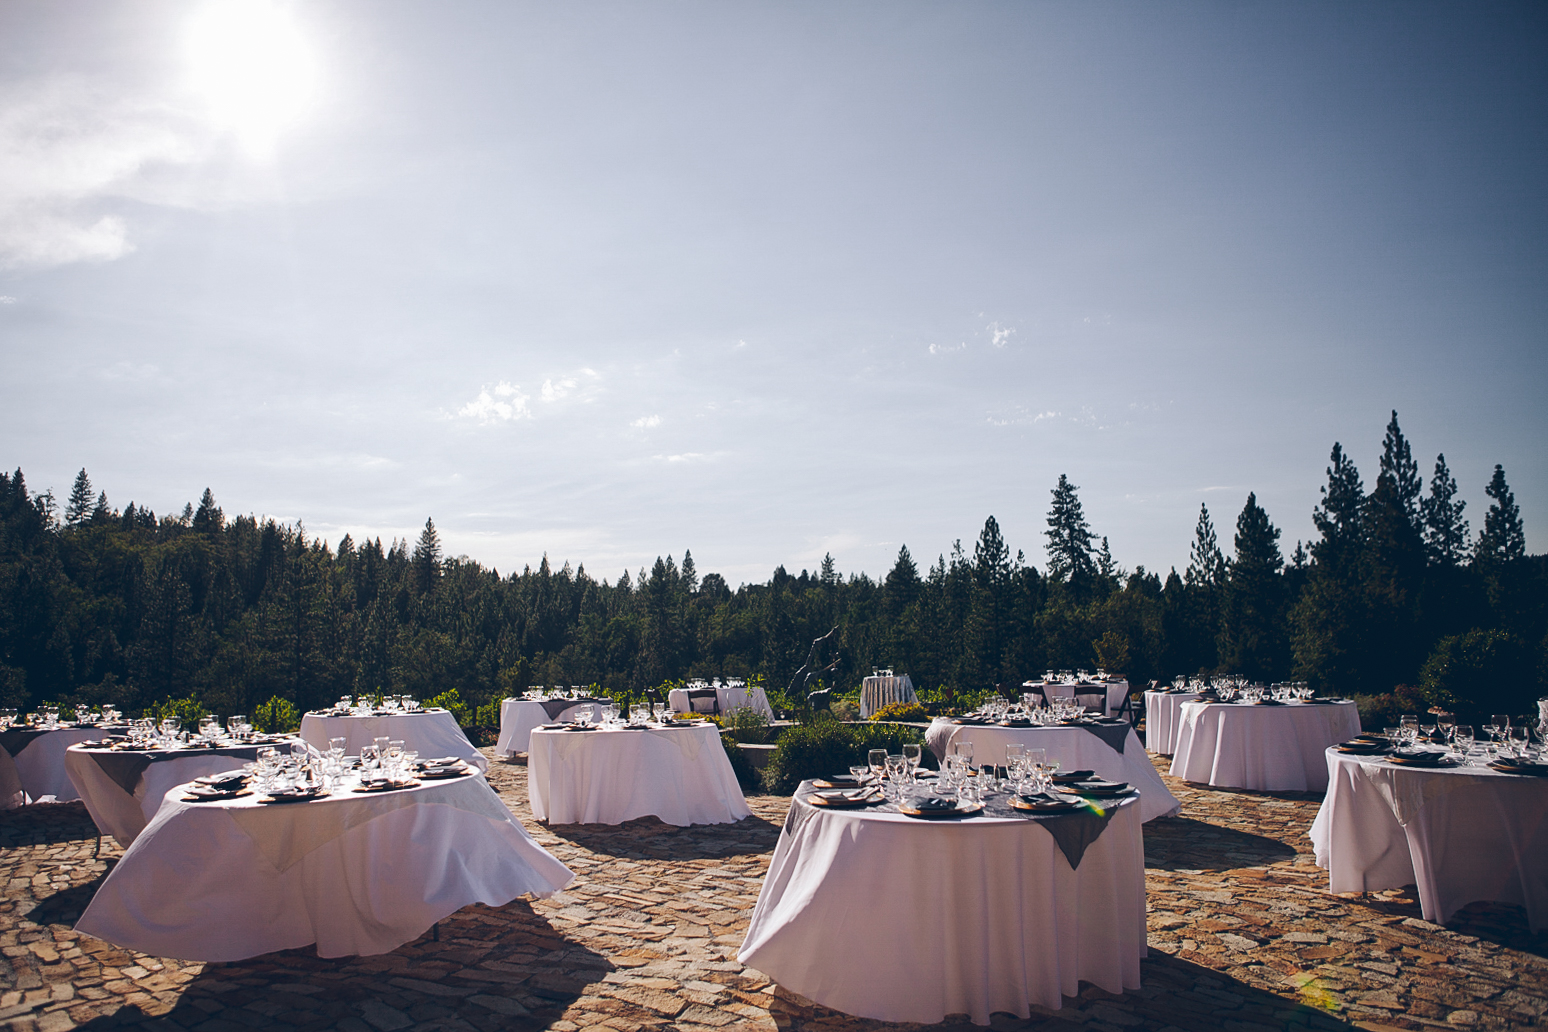 miraflores_winery_wedding_photography_ian_melissa_ebony_siovhan_bokeh_photography_17.jpg